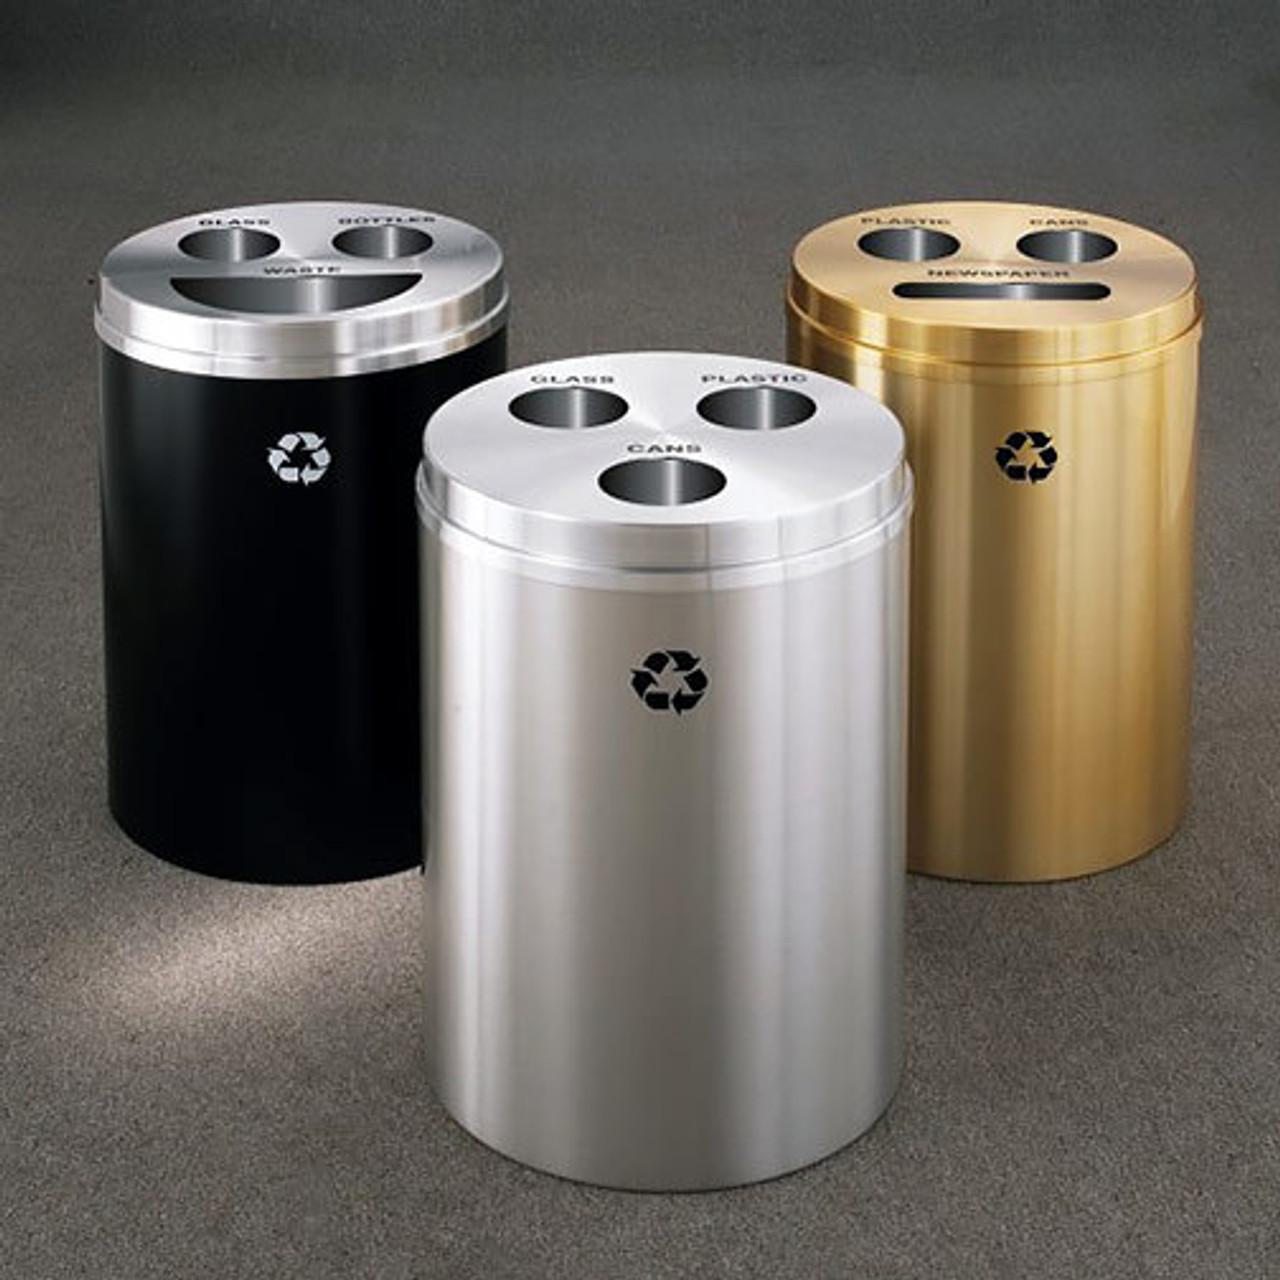 Glaro Recycling Bins - Singles & Combos